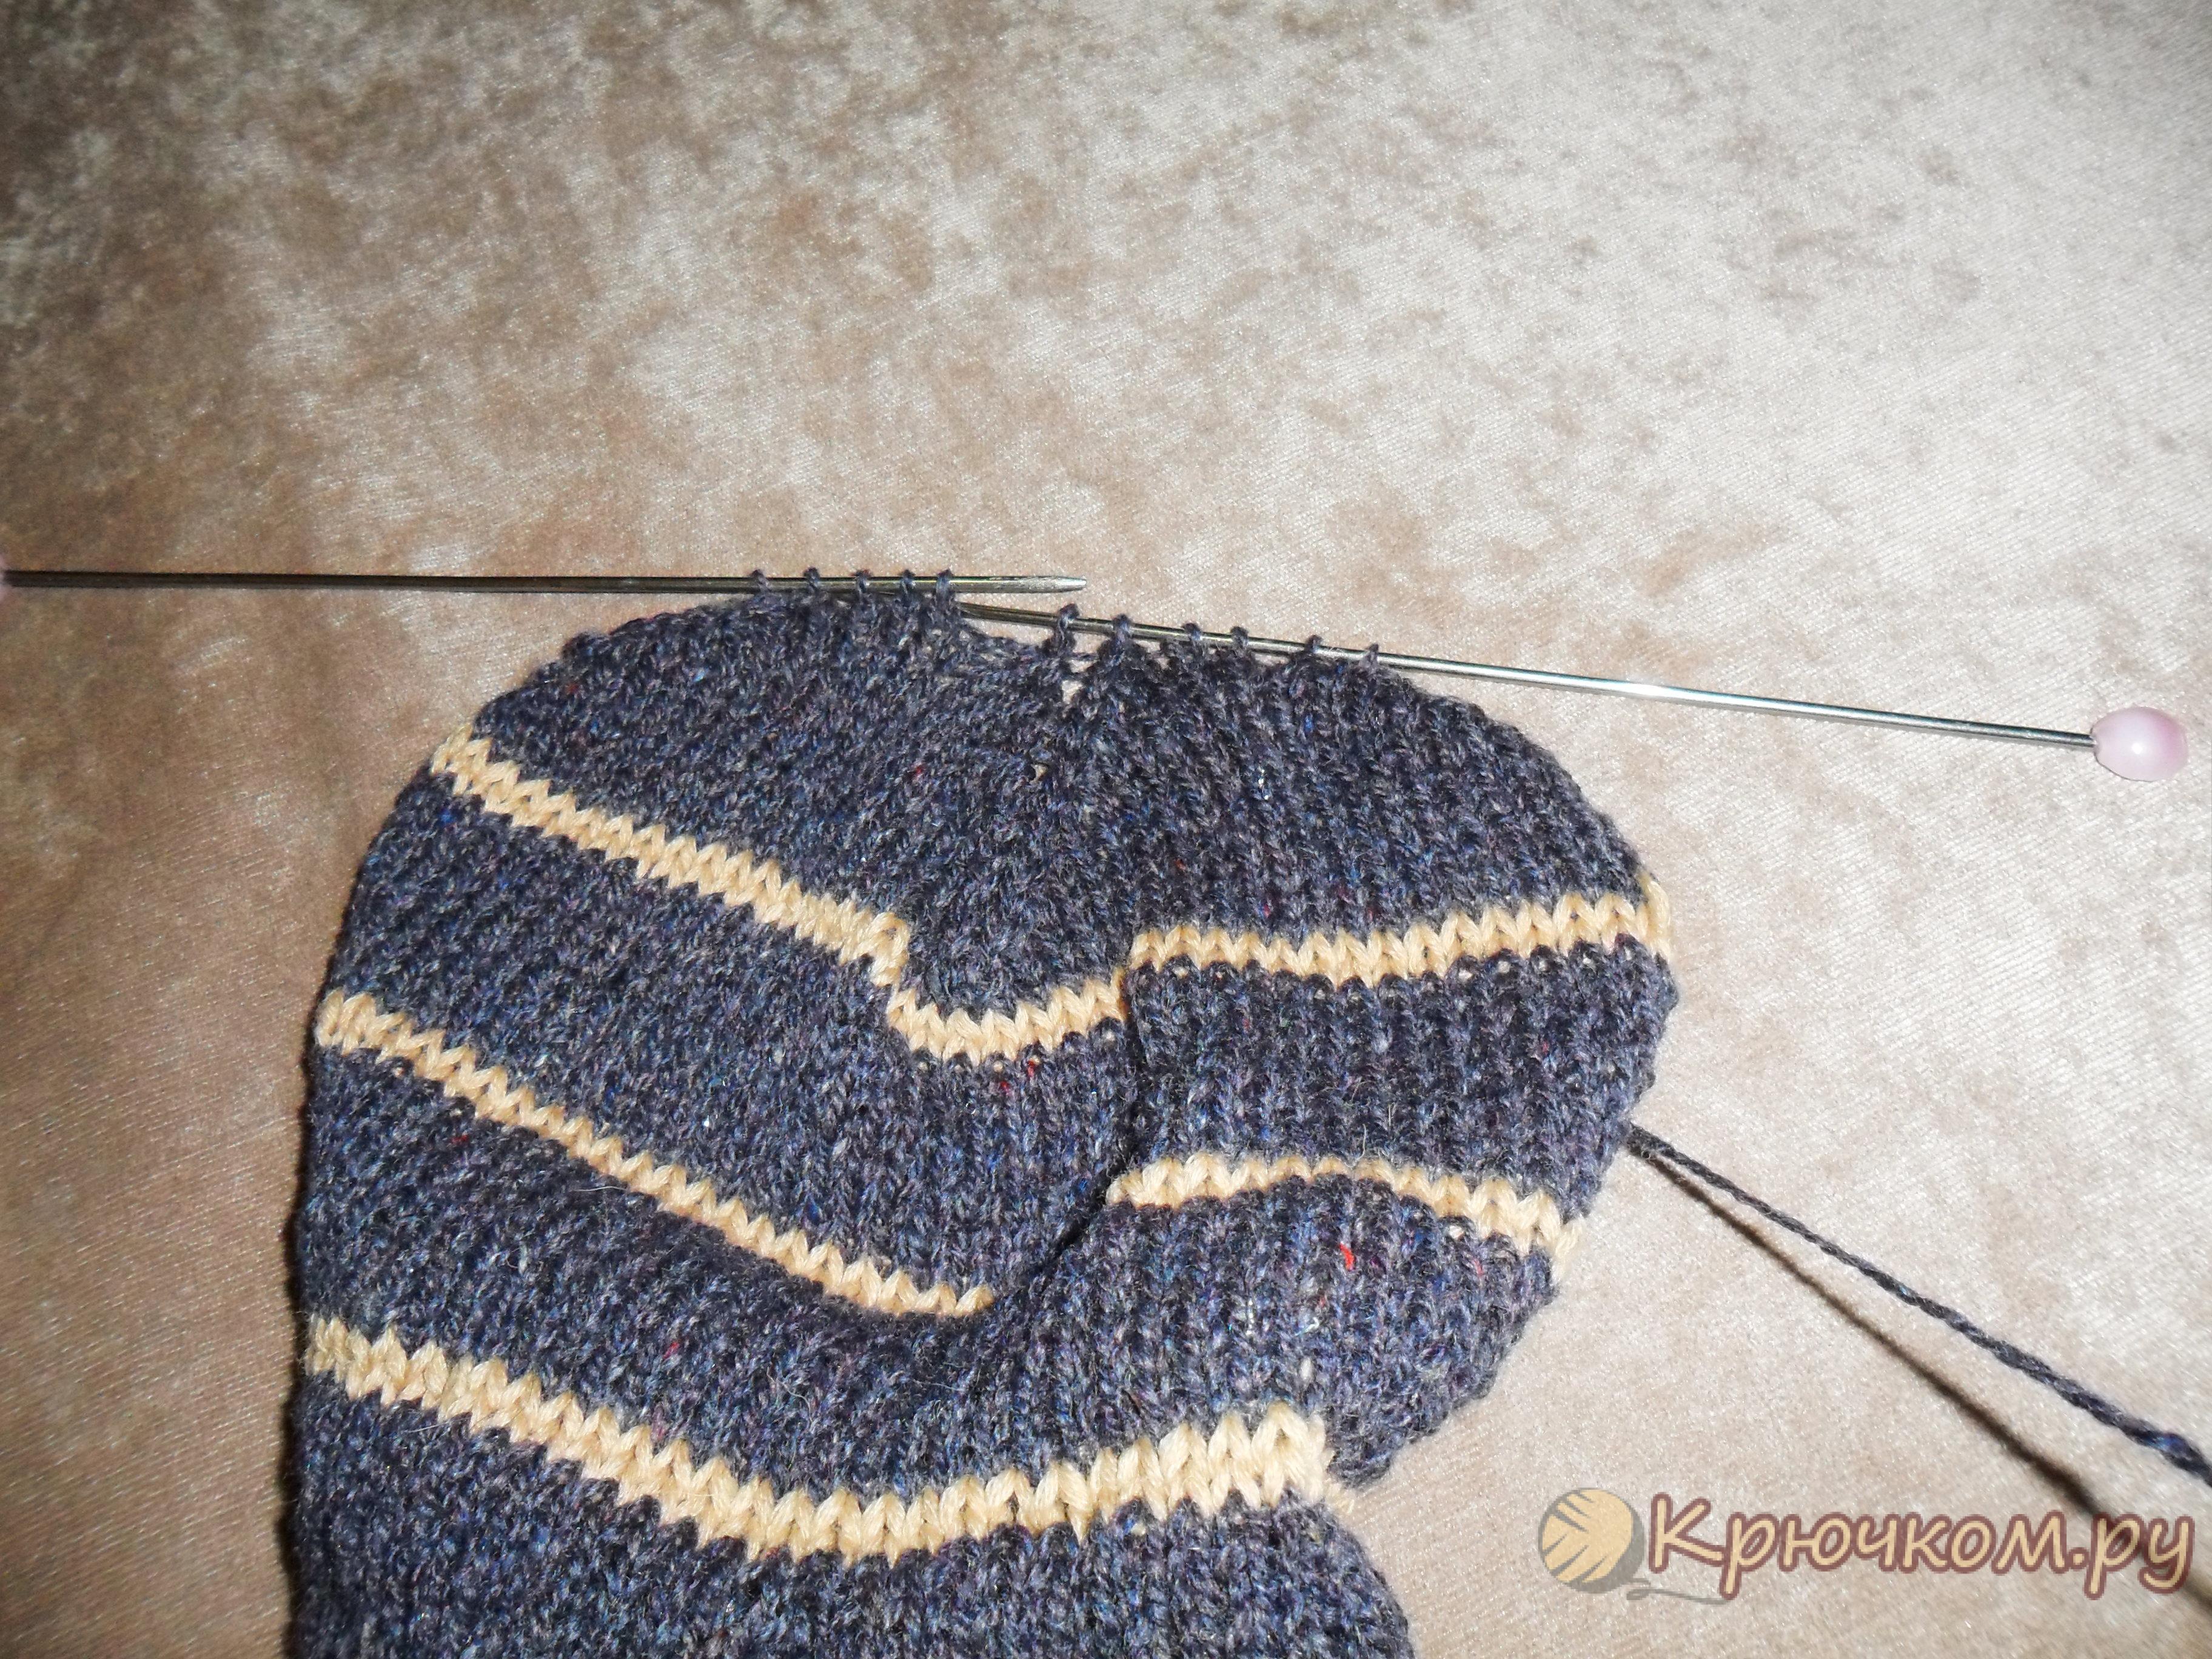 вязание носков на двух спицах фото мастер класс